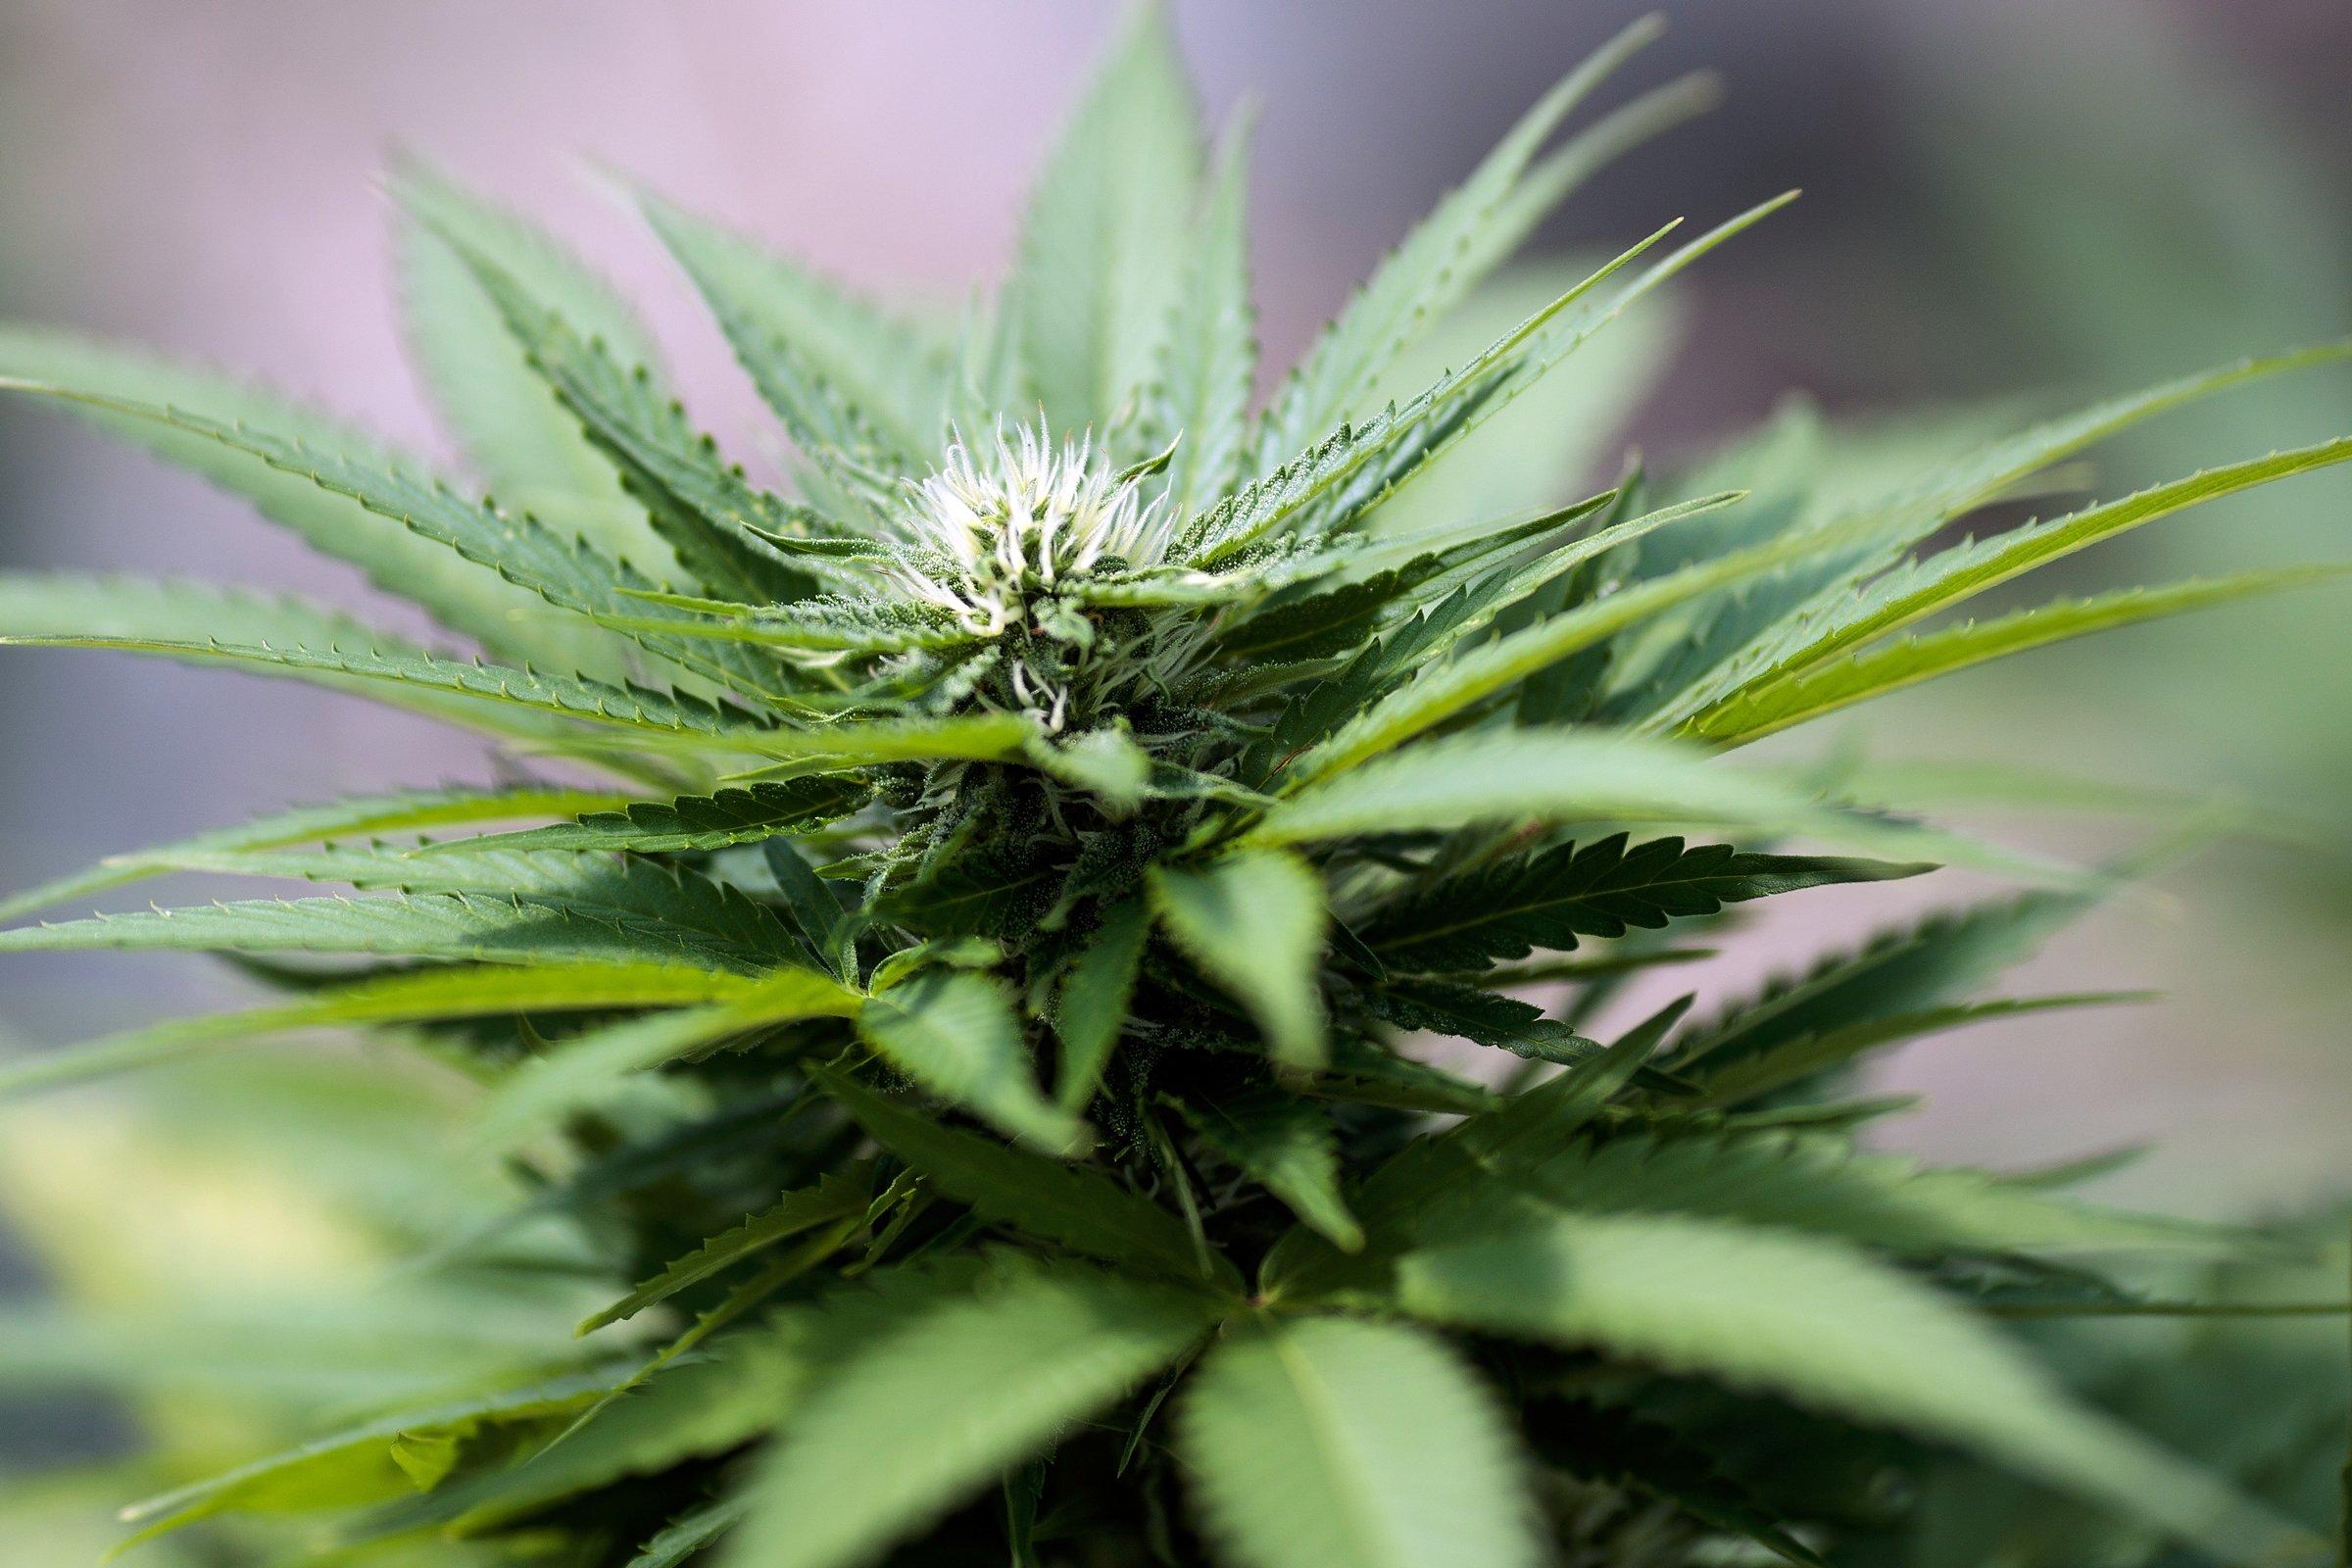 New York City Considering Major Marijuana Testing Ban